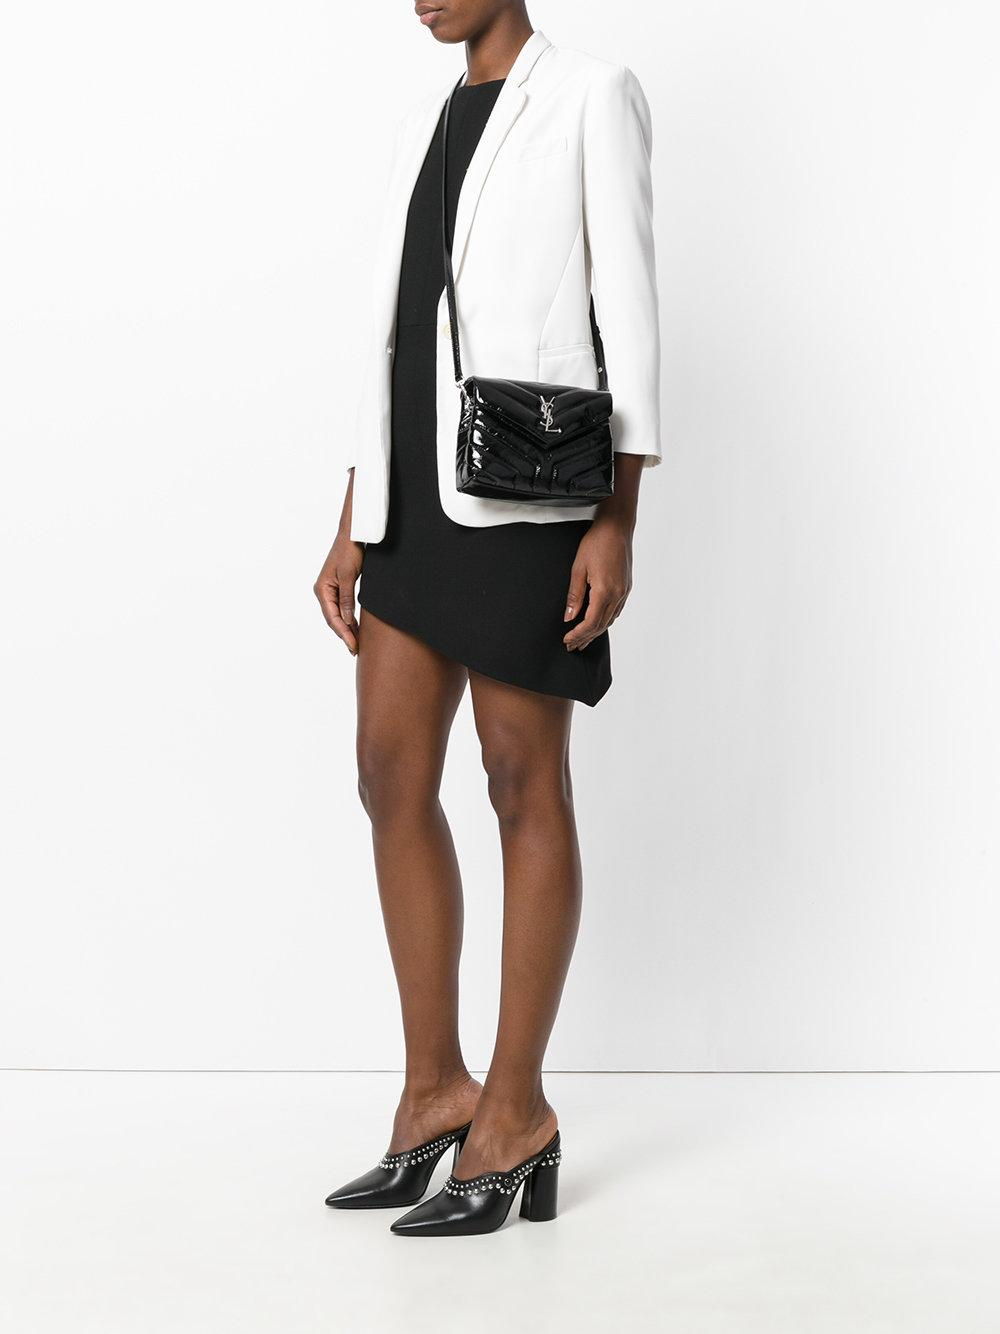 Saint Laurent Toy Loulou Strap Bag In Black Lyst